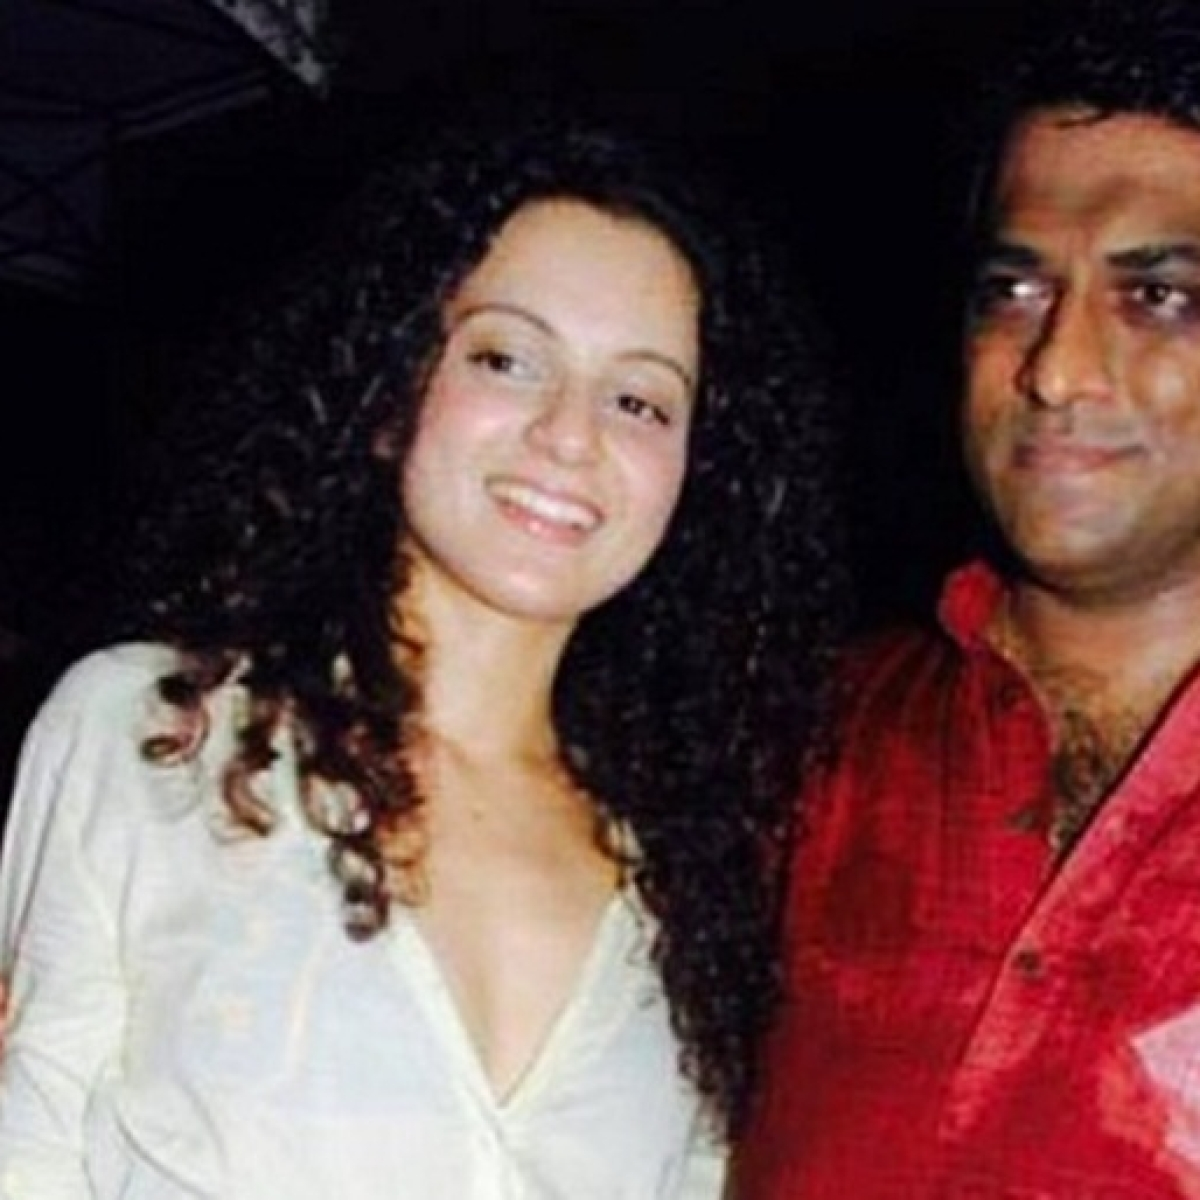 'Never thought Kangana Ranaut will become so huge': Anurag Basu